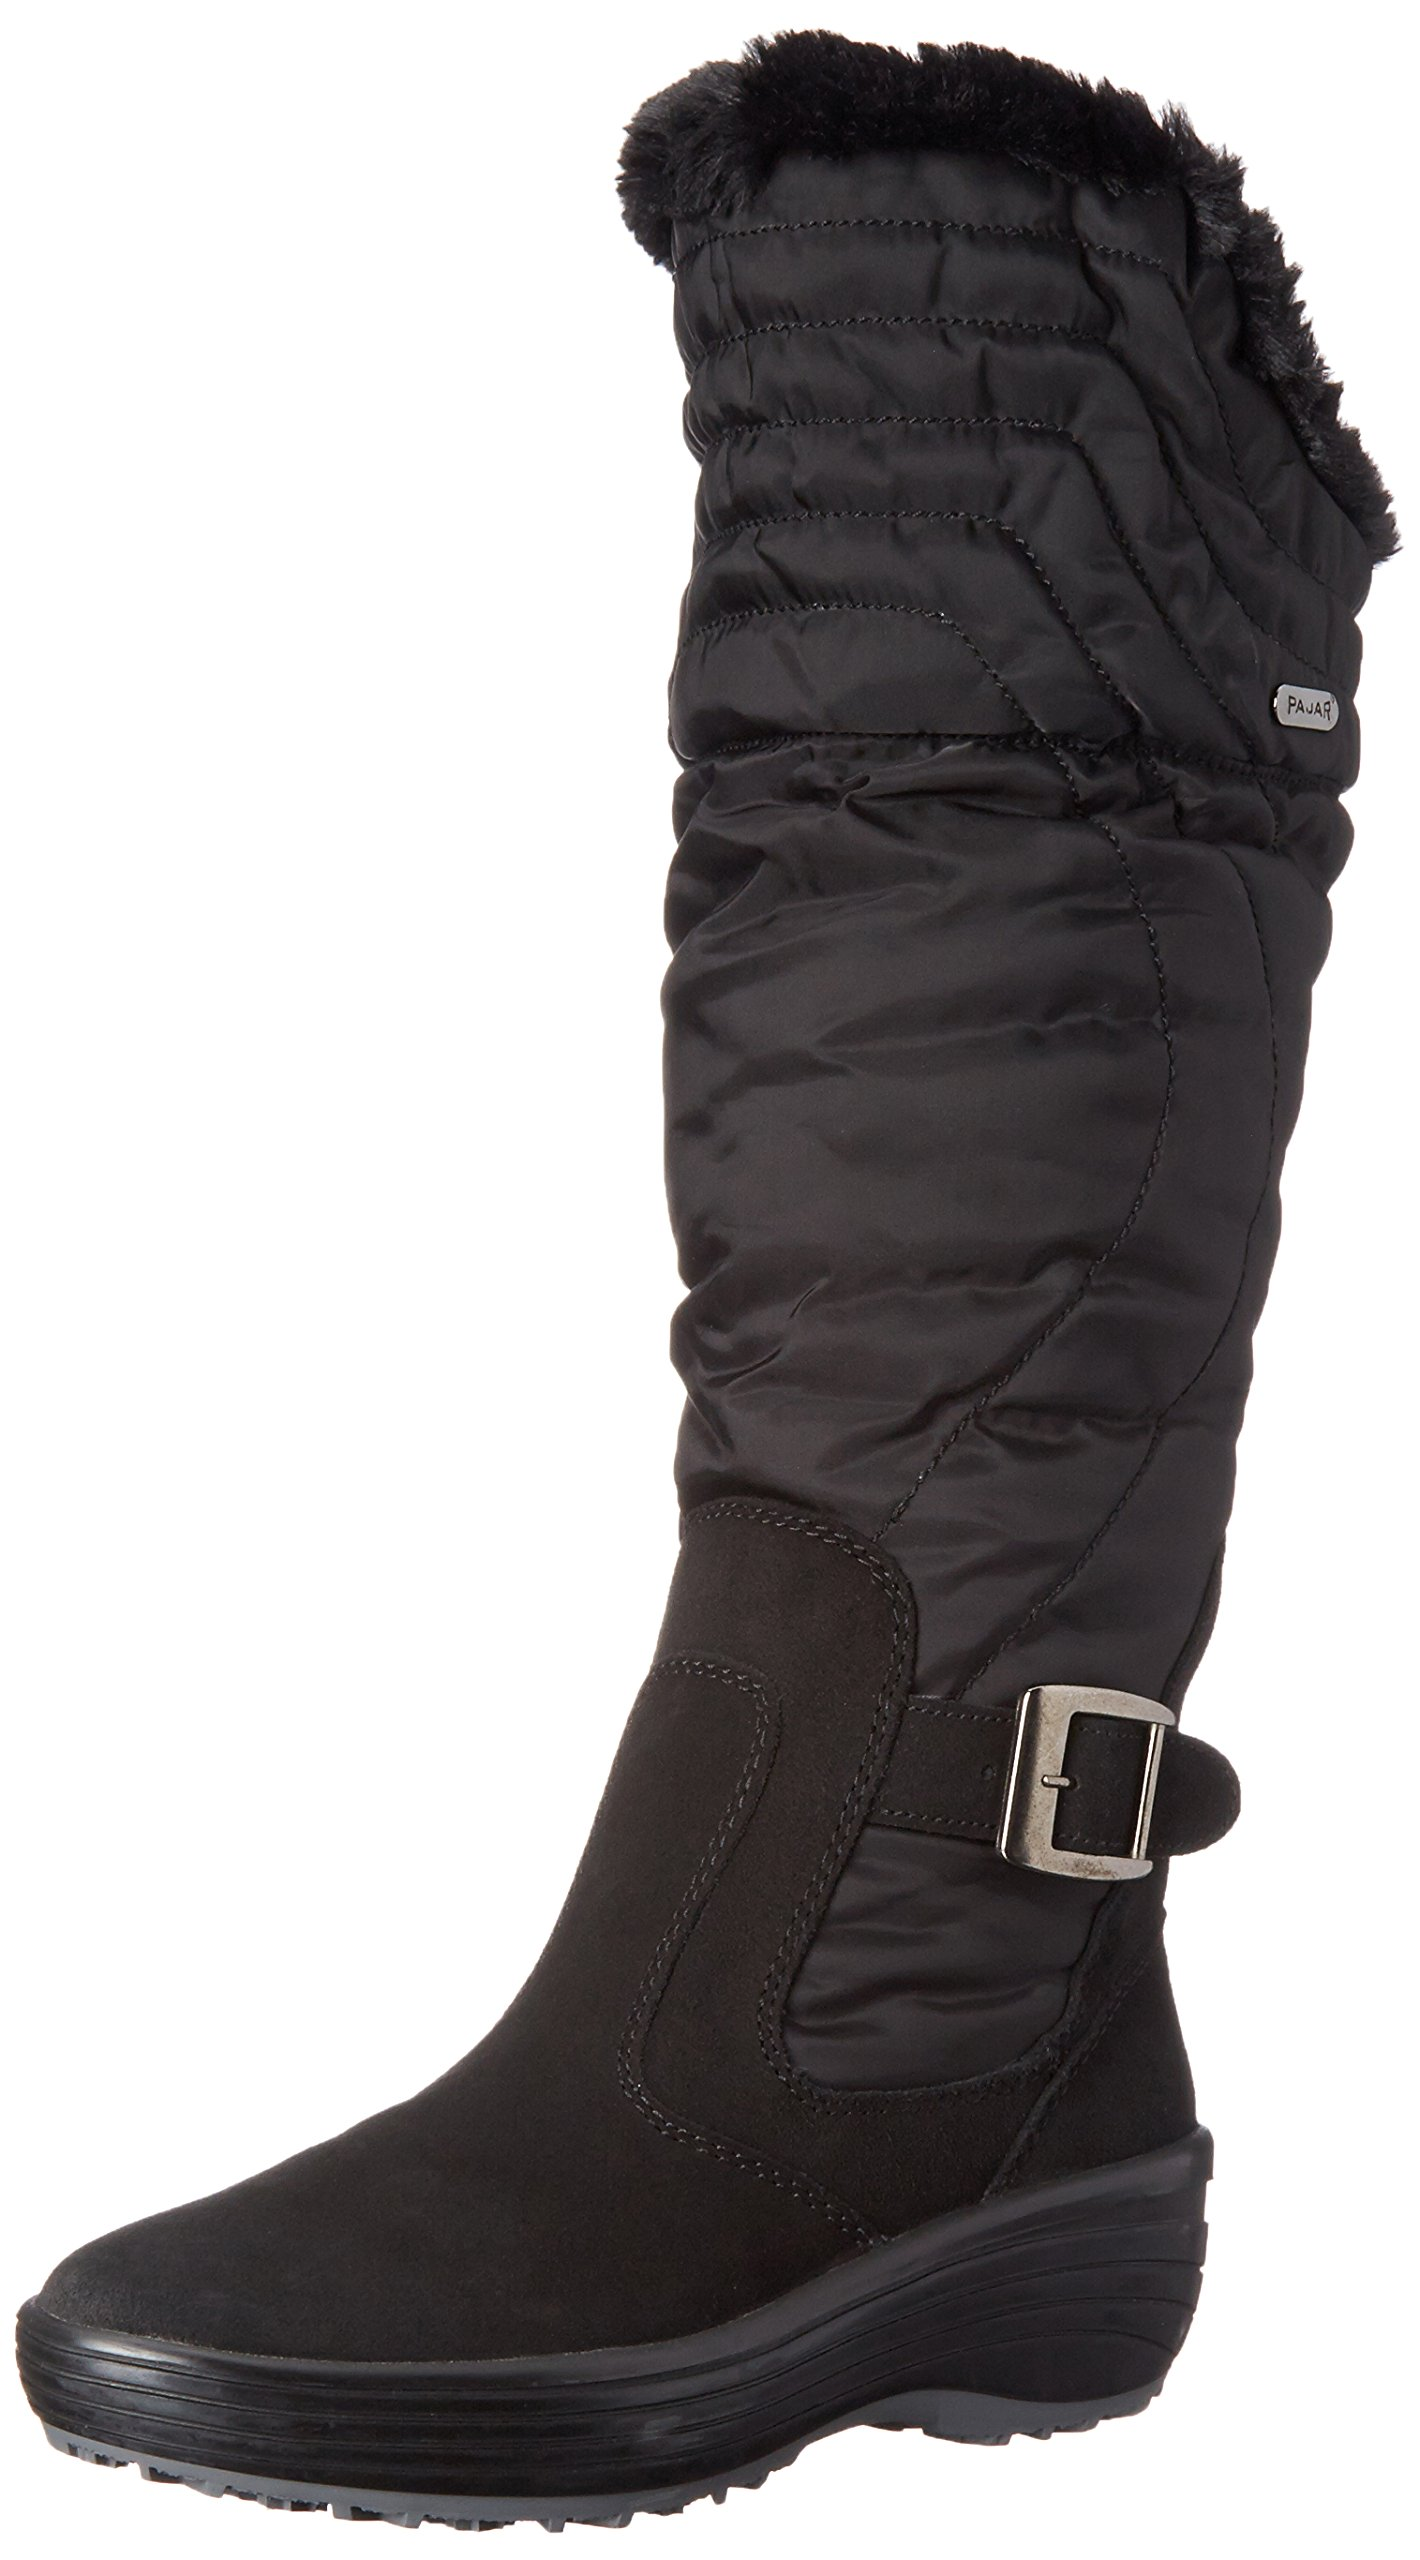 Pajar Women's Natasha Boot, Black, 40 EU/9-9.5 M US